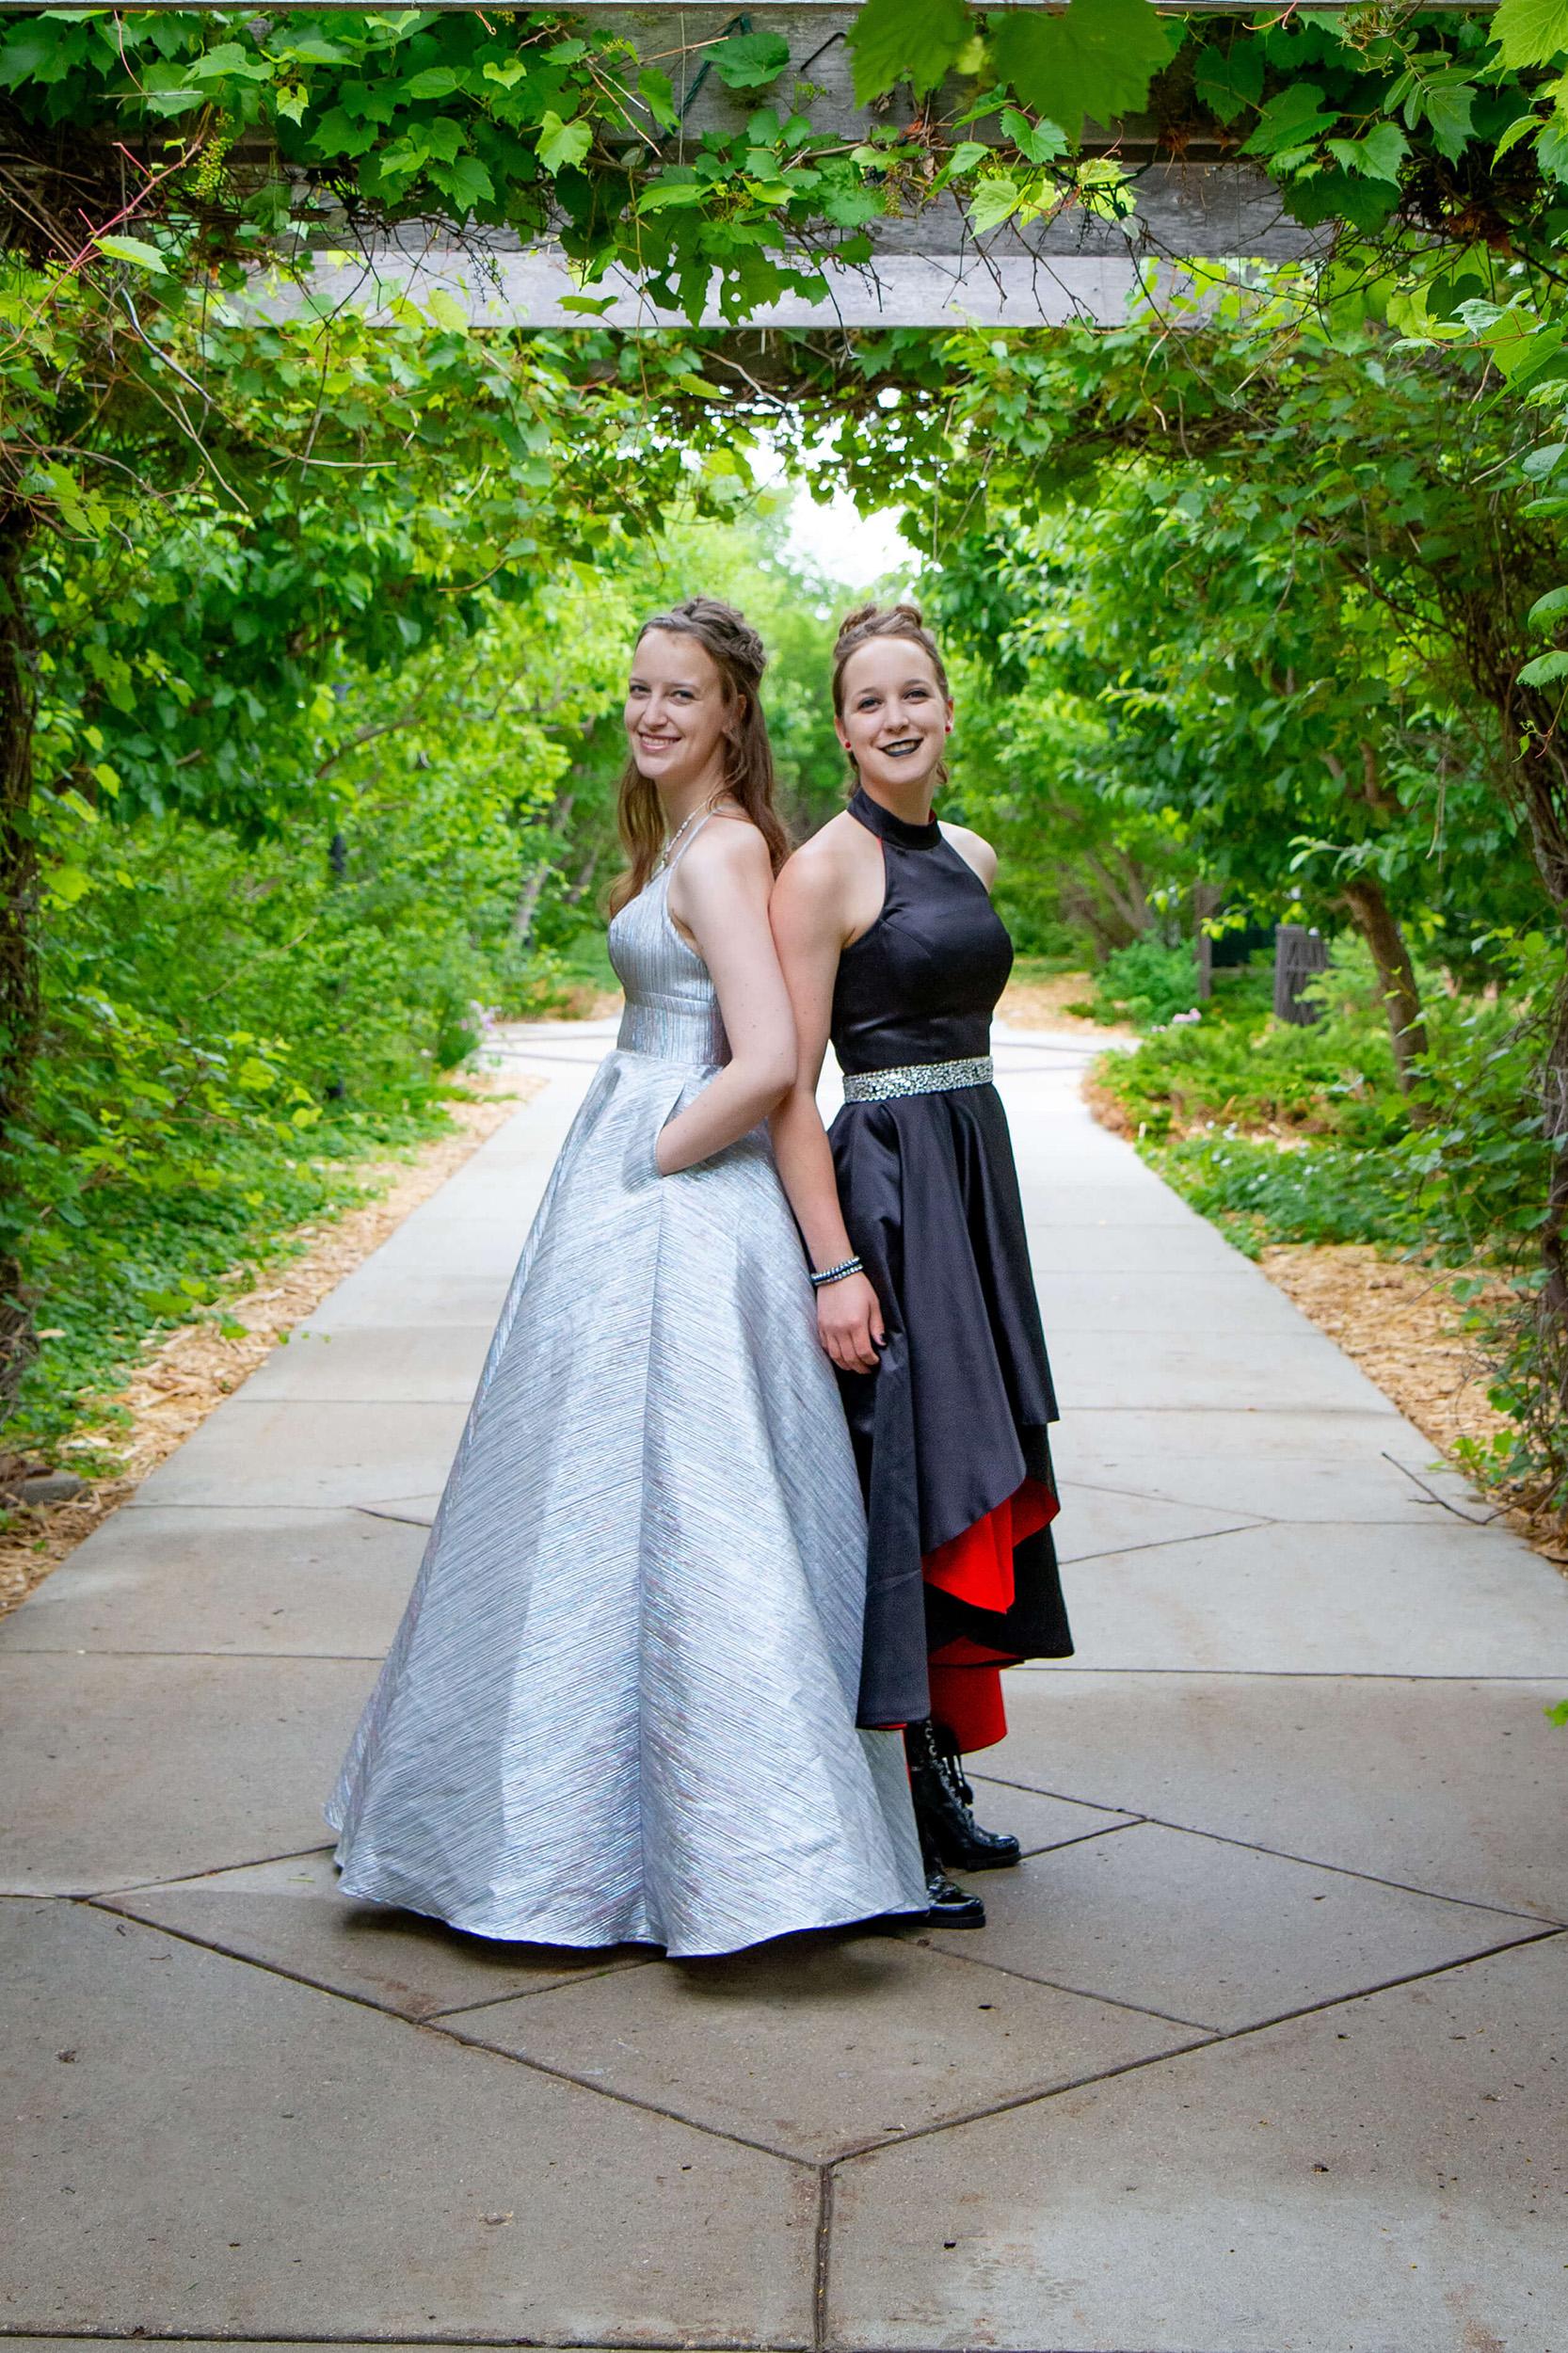 Saskatoon Formal Grad Prom females twins Boffins Gardens